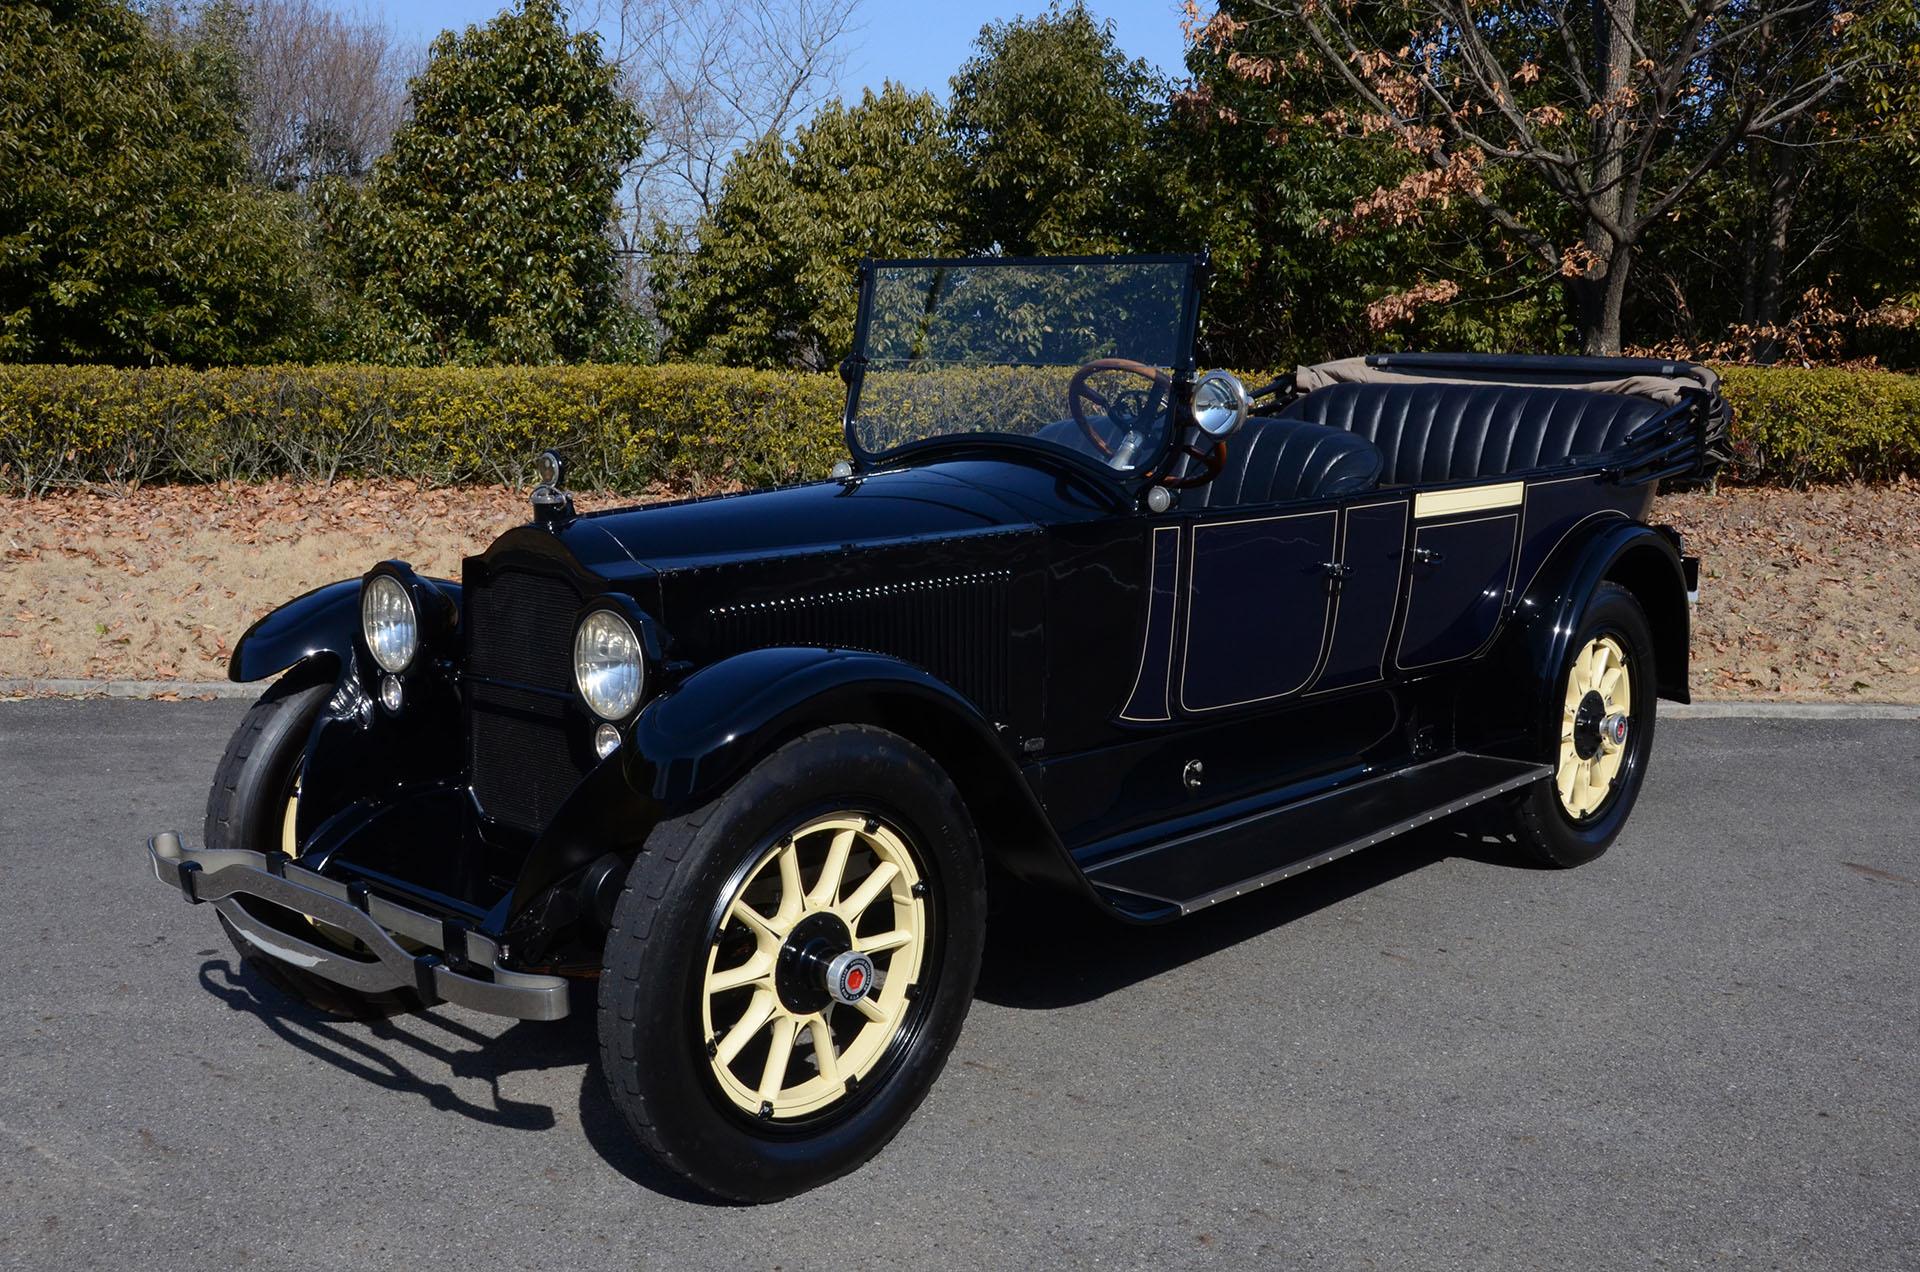 1937 Horch 853 2016 Classic Car Festival The News Wheel